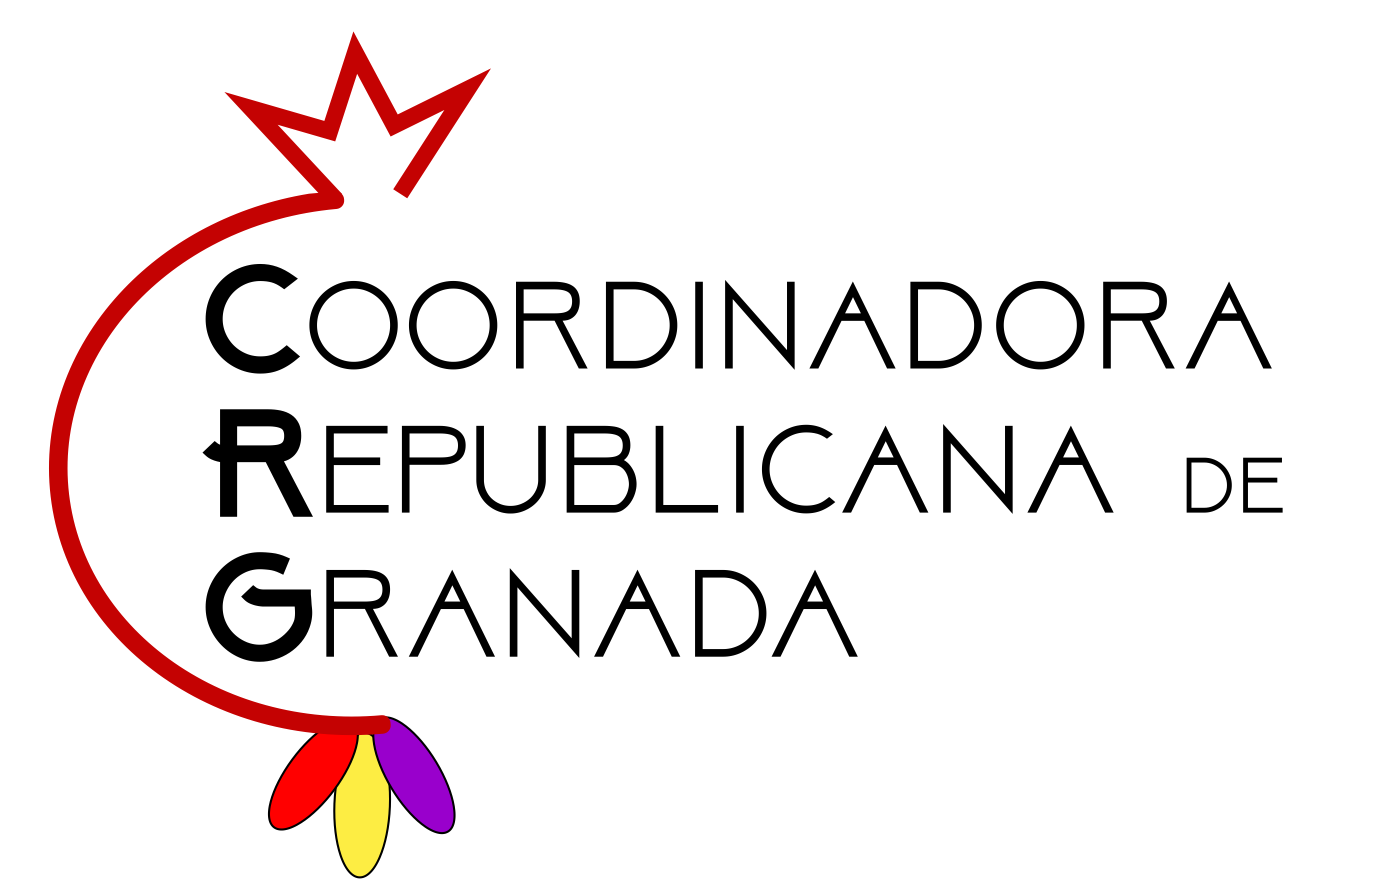 Coordinadora Republicana de Granada